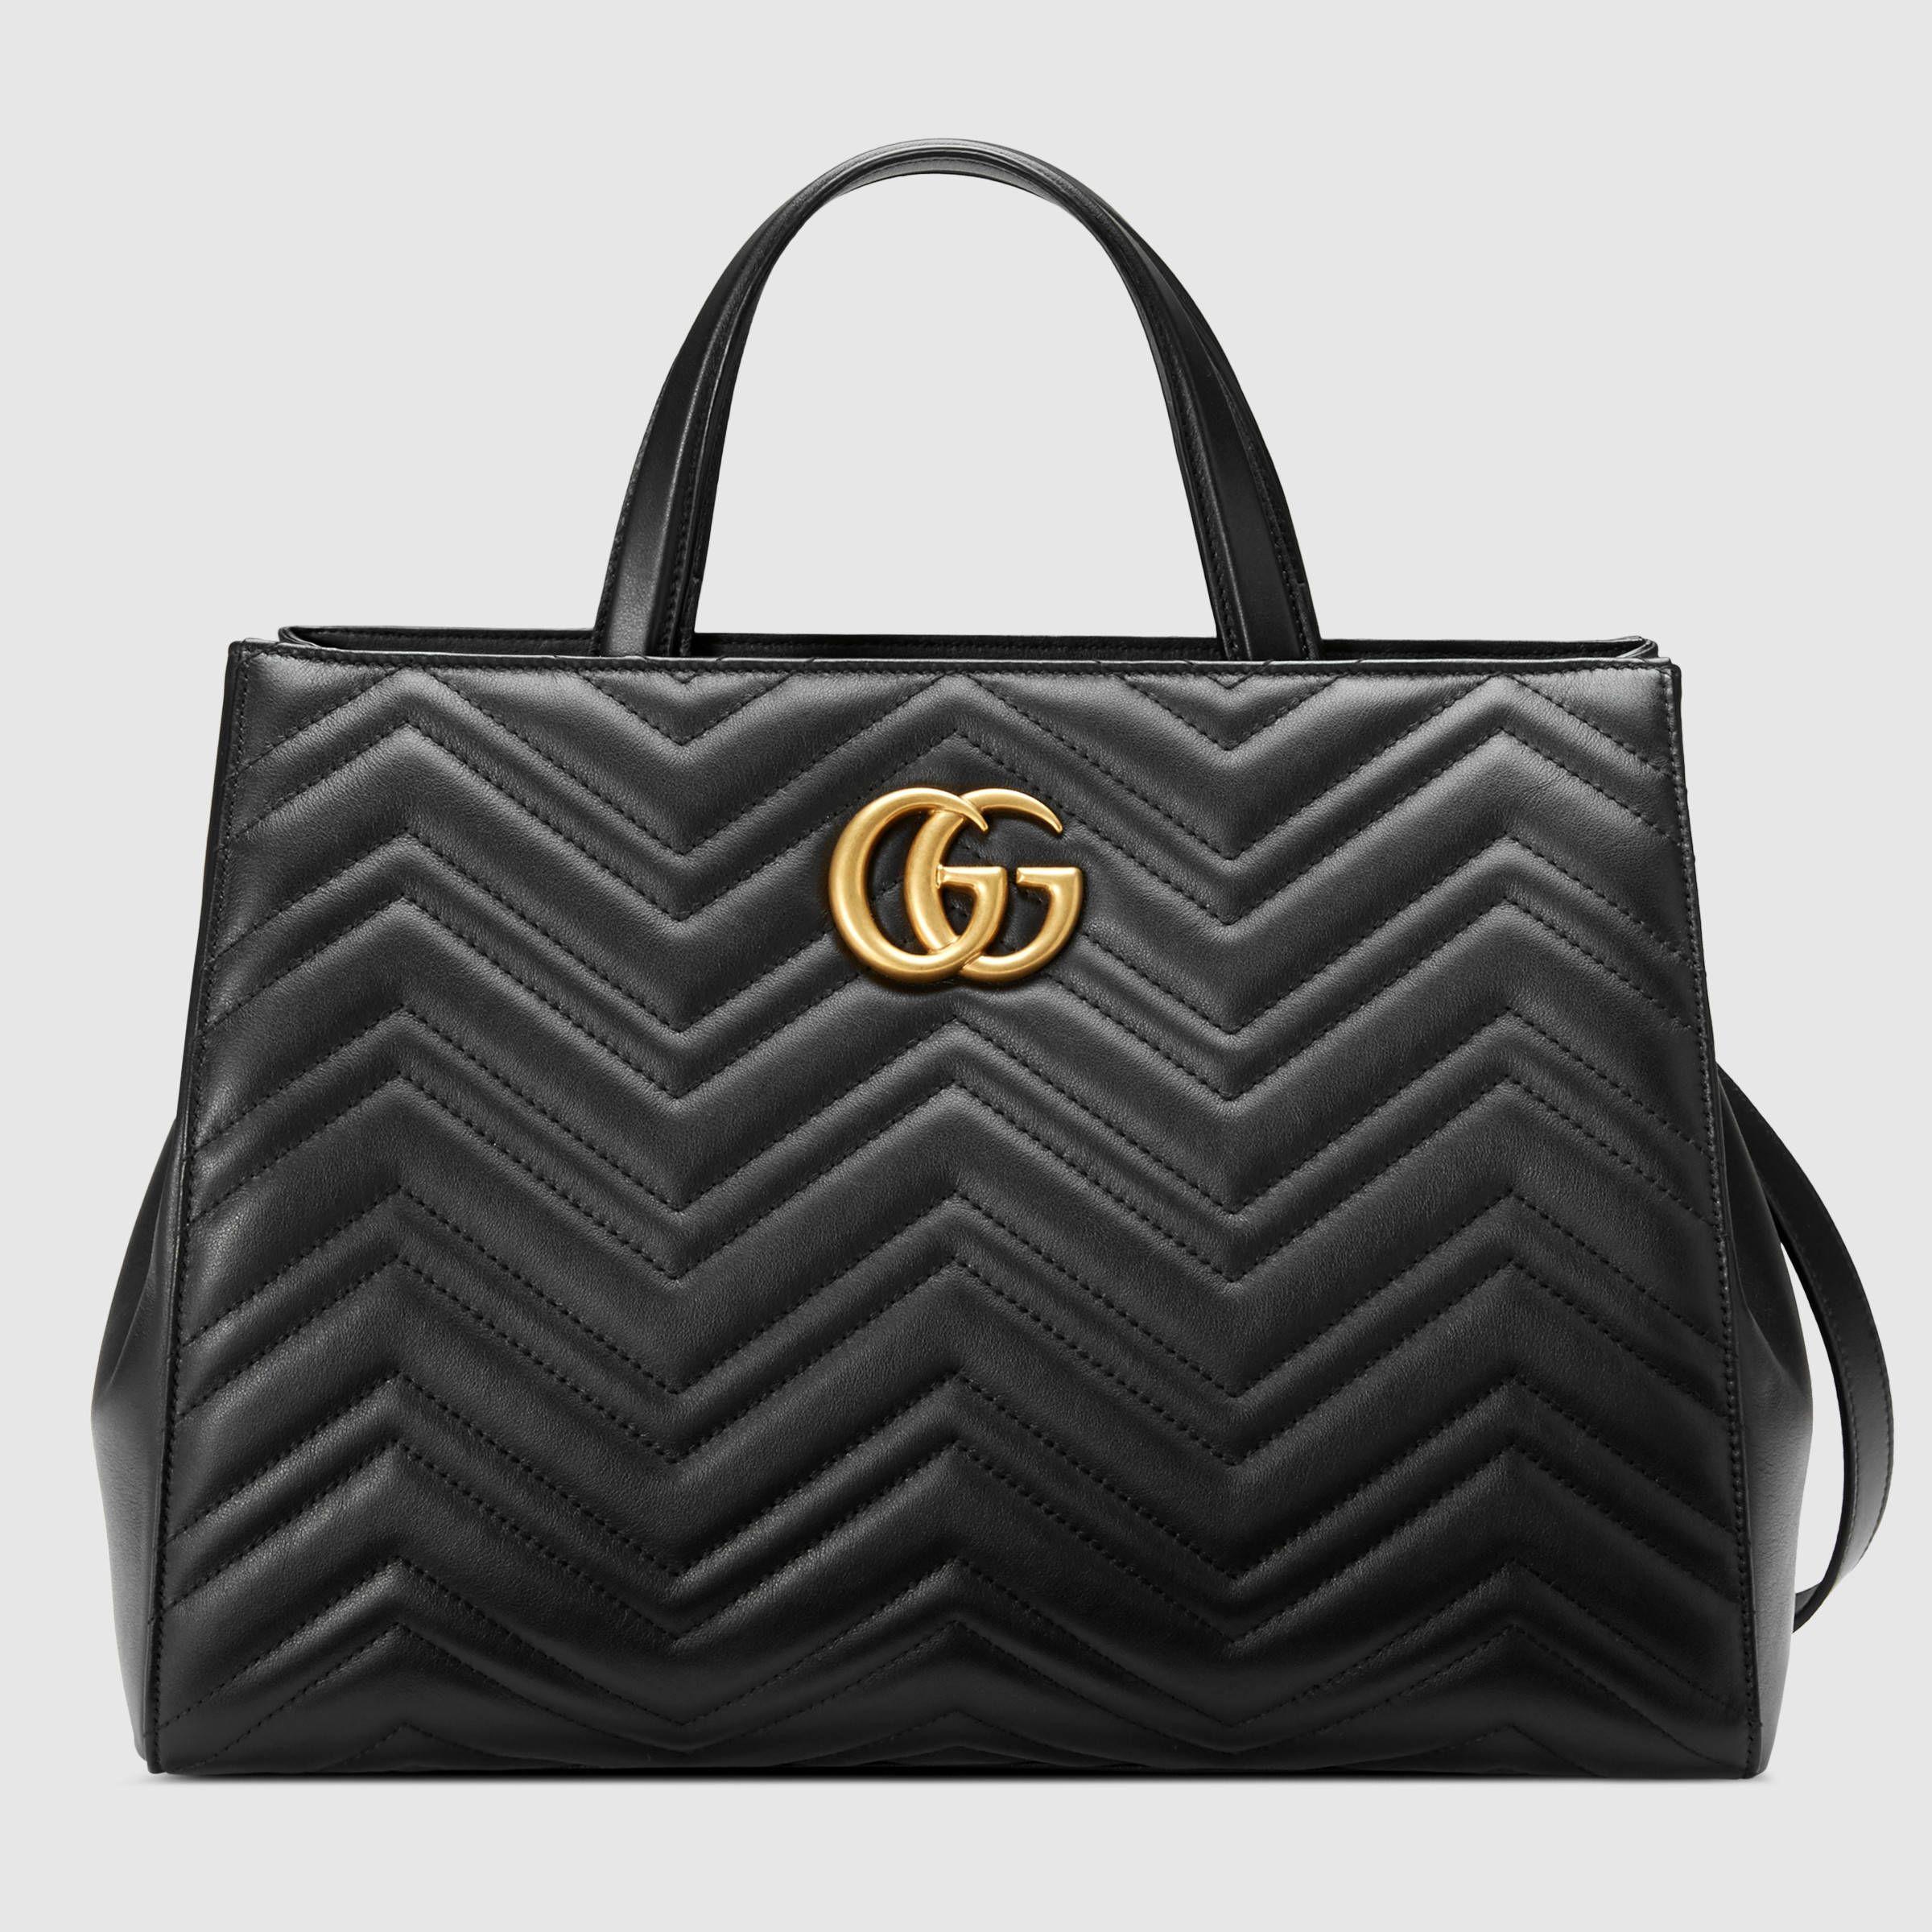 ca8eeeac GG Marmont matelassé top handle bag - Gucci Women's Top ...